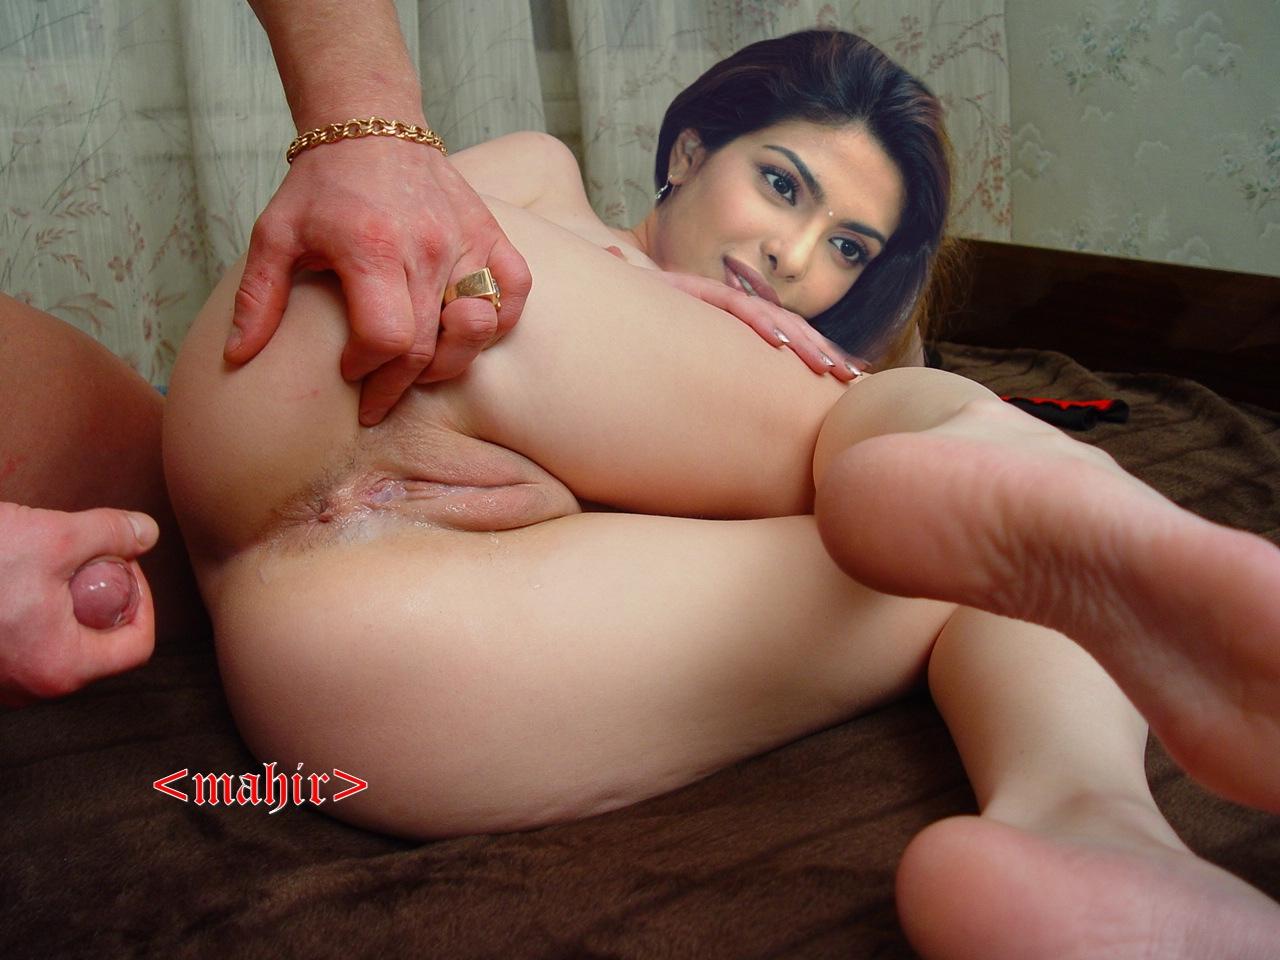 Priyanka full naked x pic